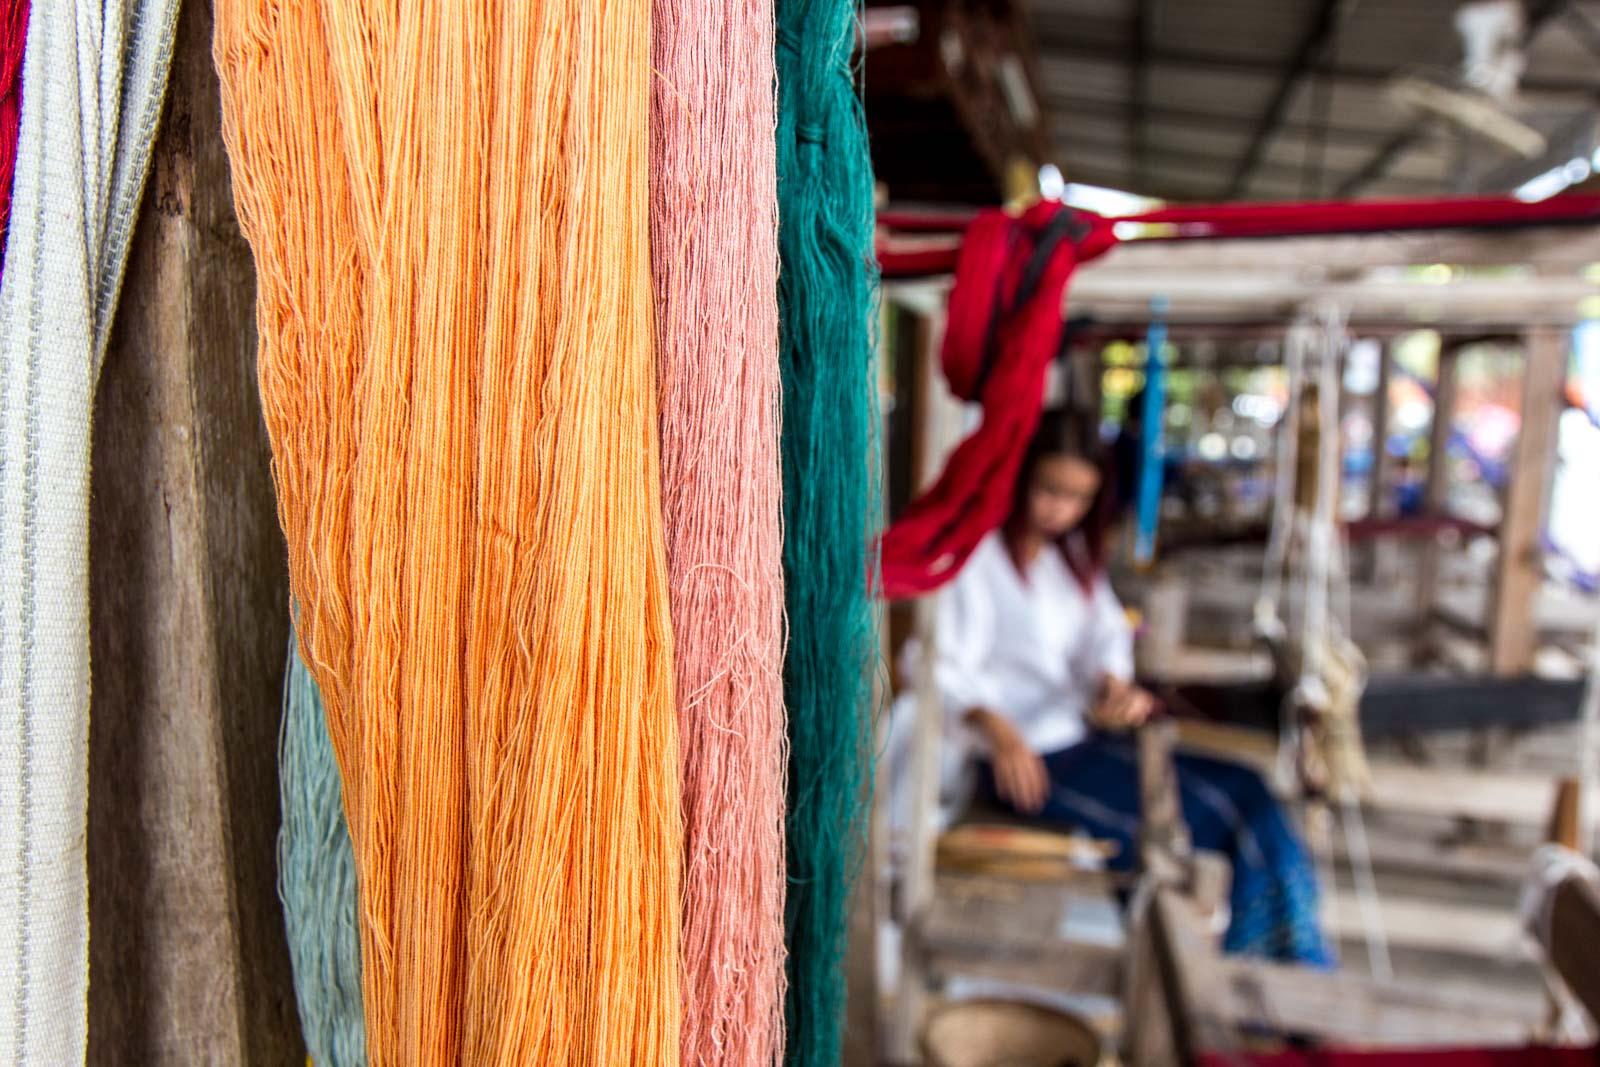 Pranom Tapang, Tin-Chok weaving, Phrae, Thailand